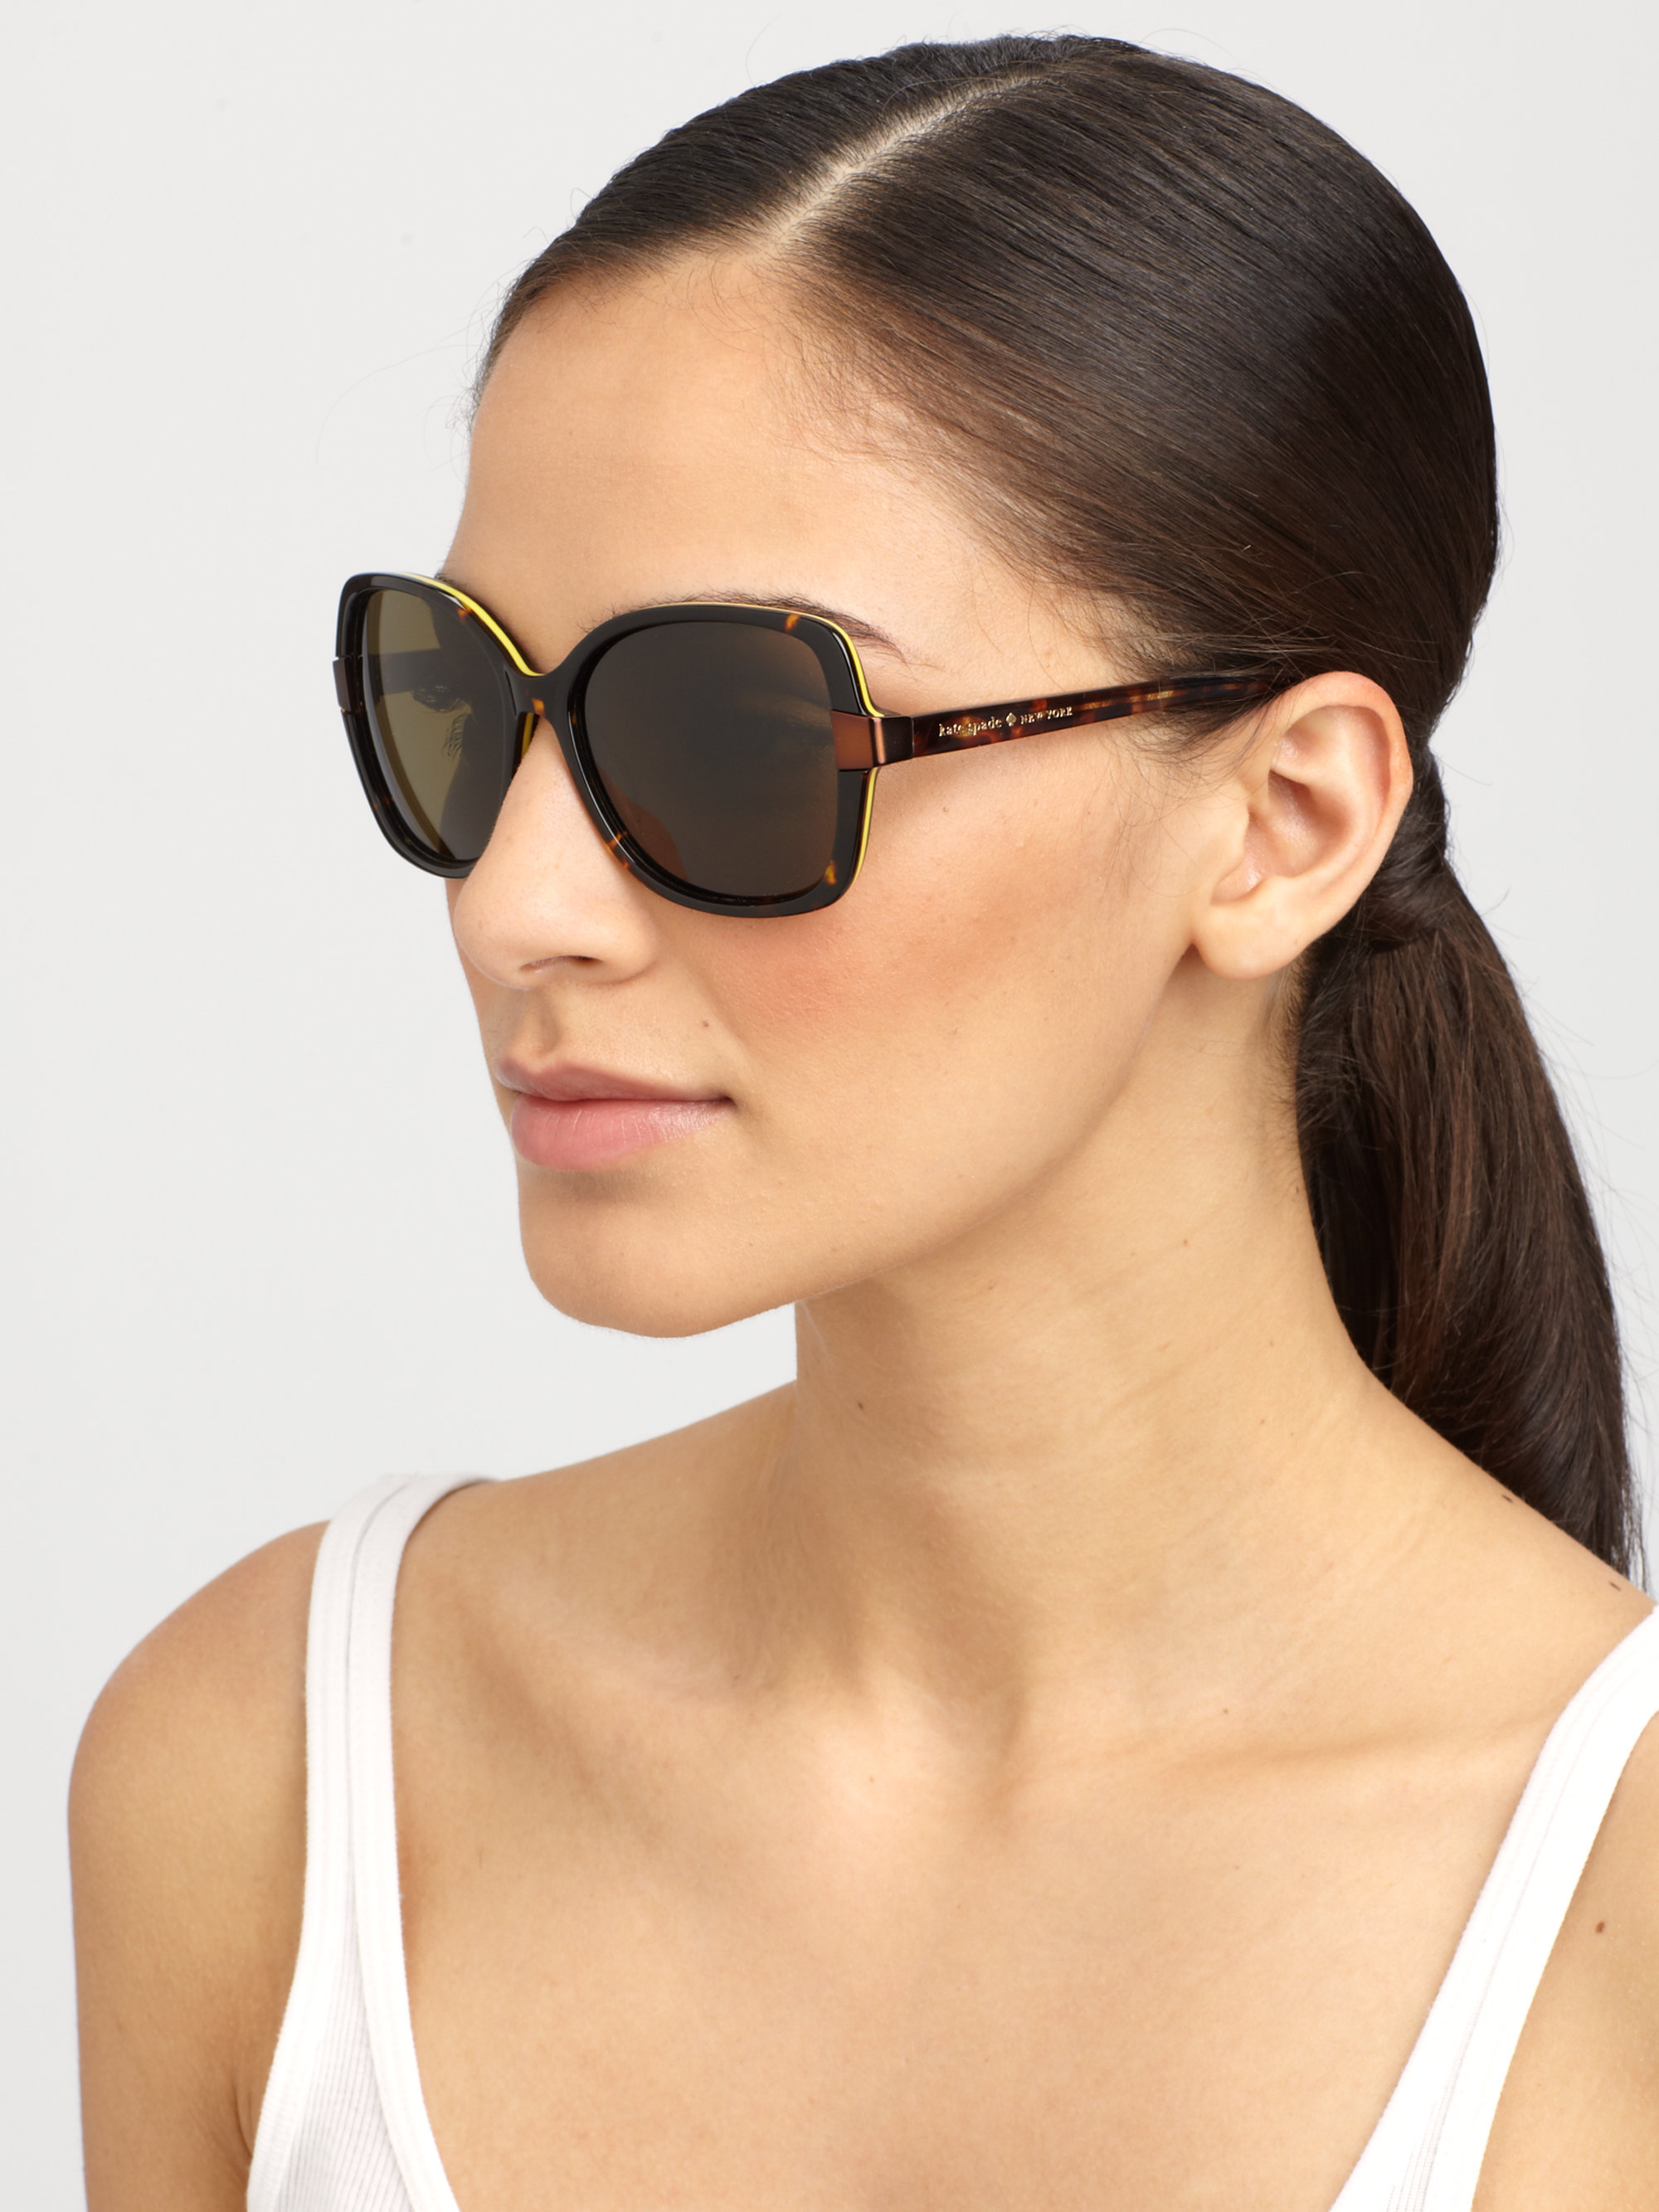 Kate Spade New York Adamina Acetate Polarized Sunglasses